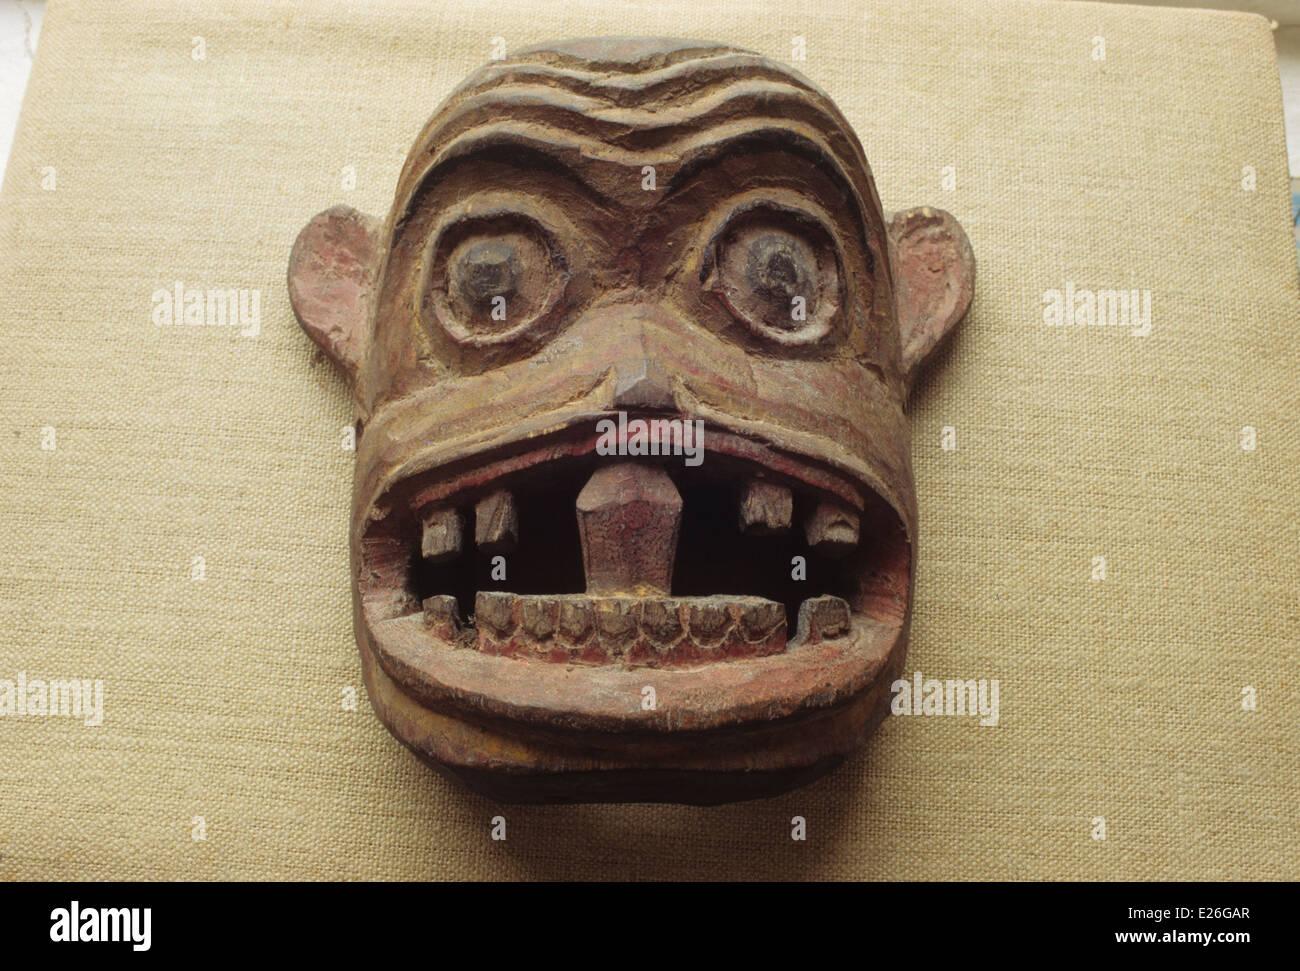 Bhután,máscara de madera del siglo xix, colección privada. Foto de stock